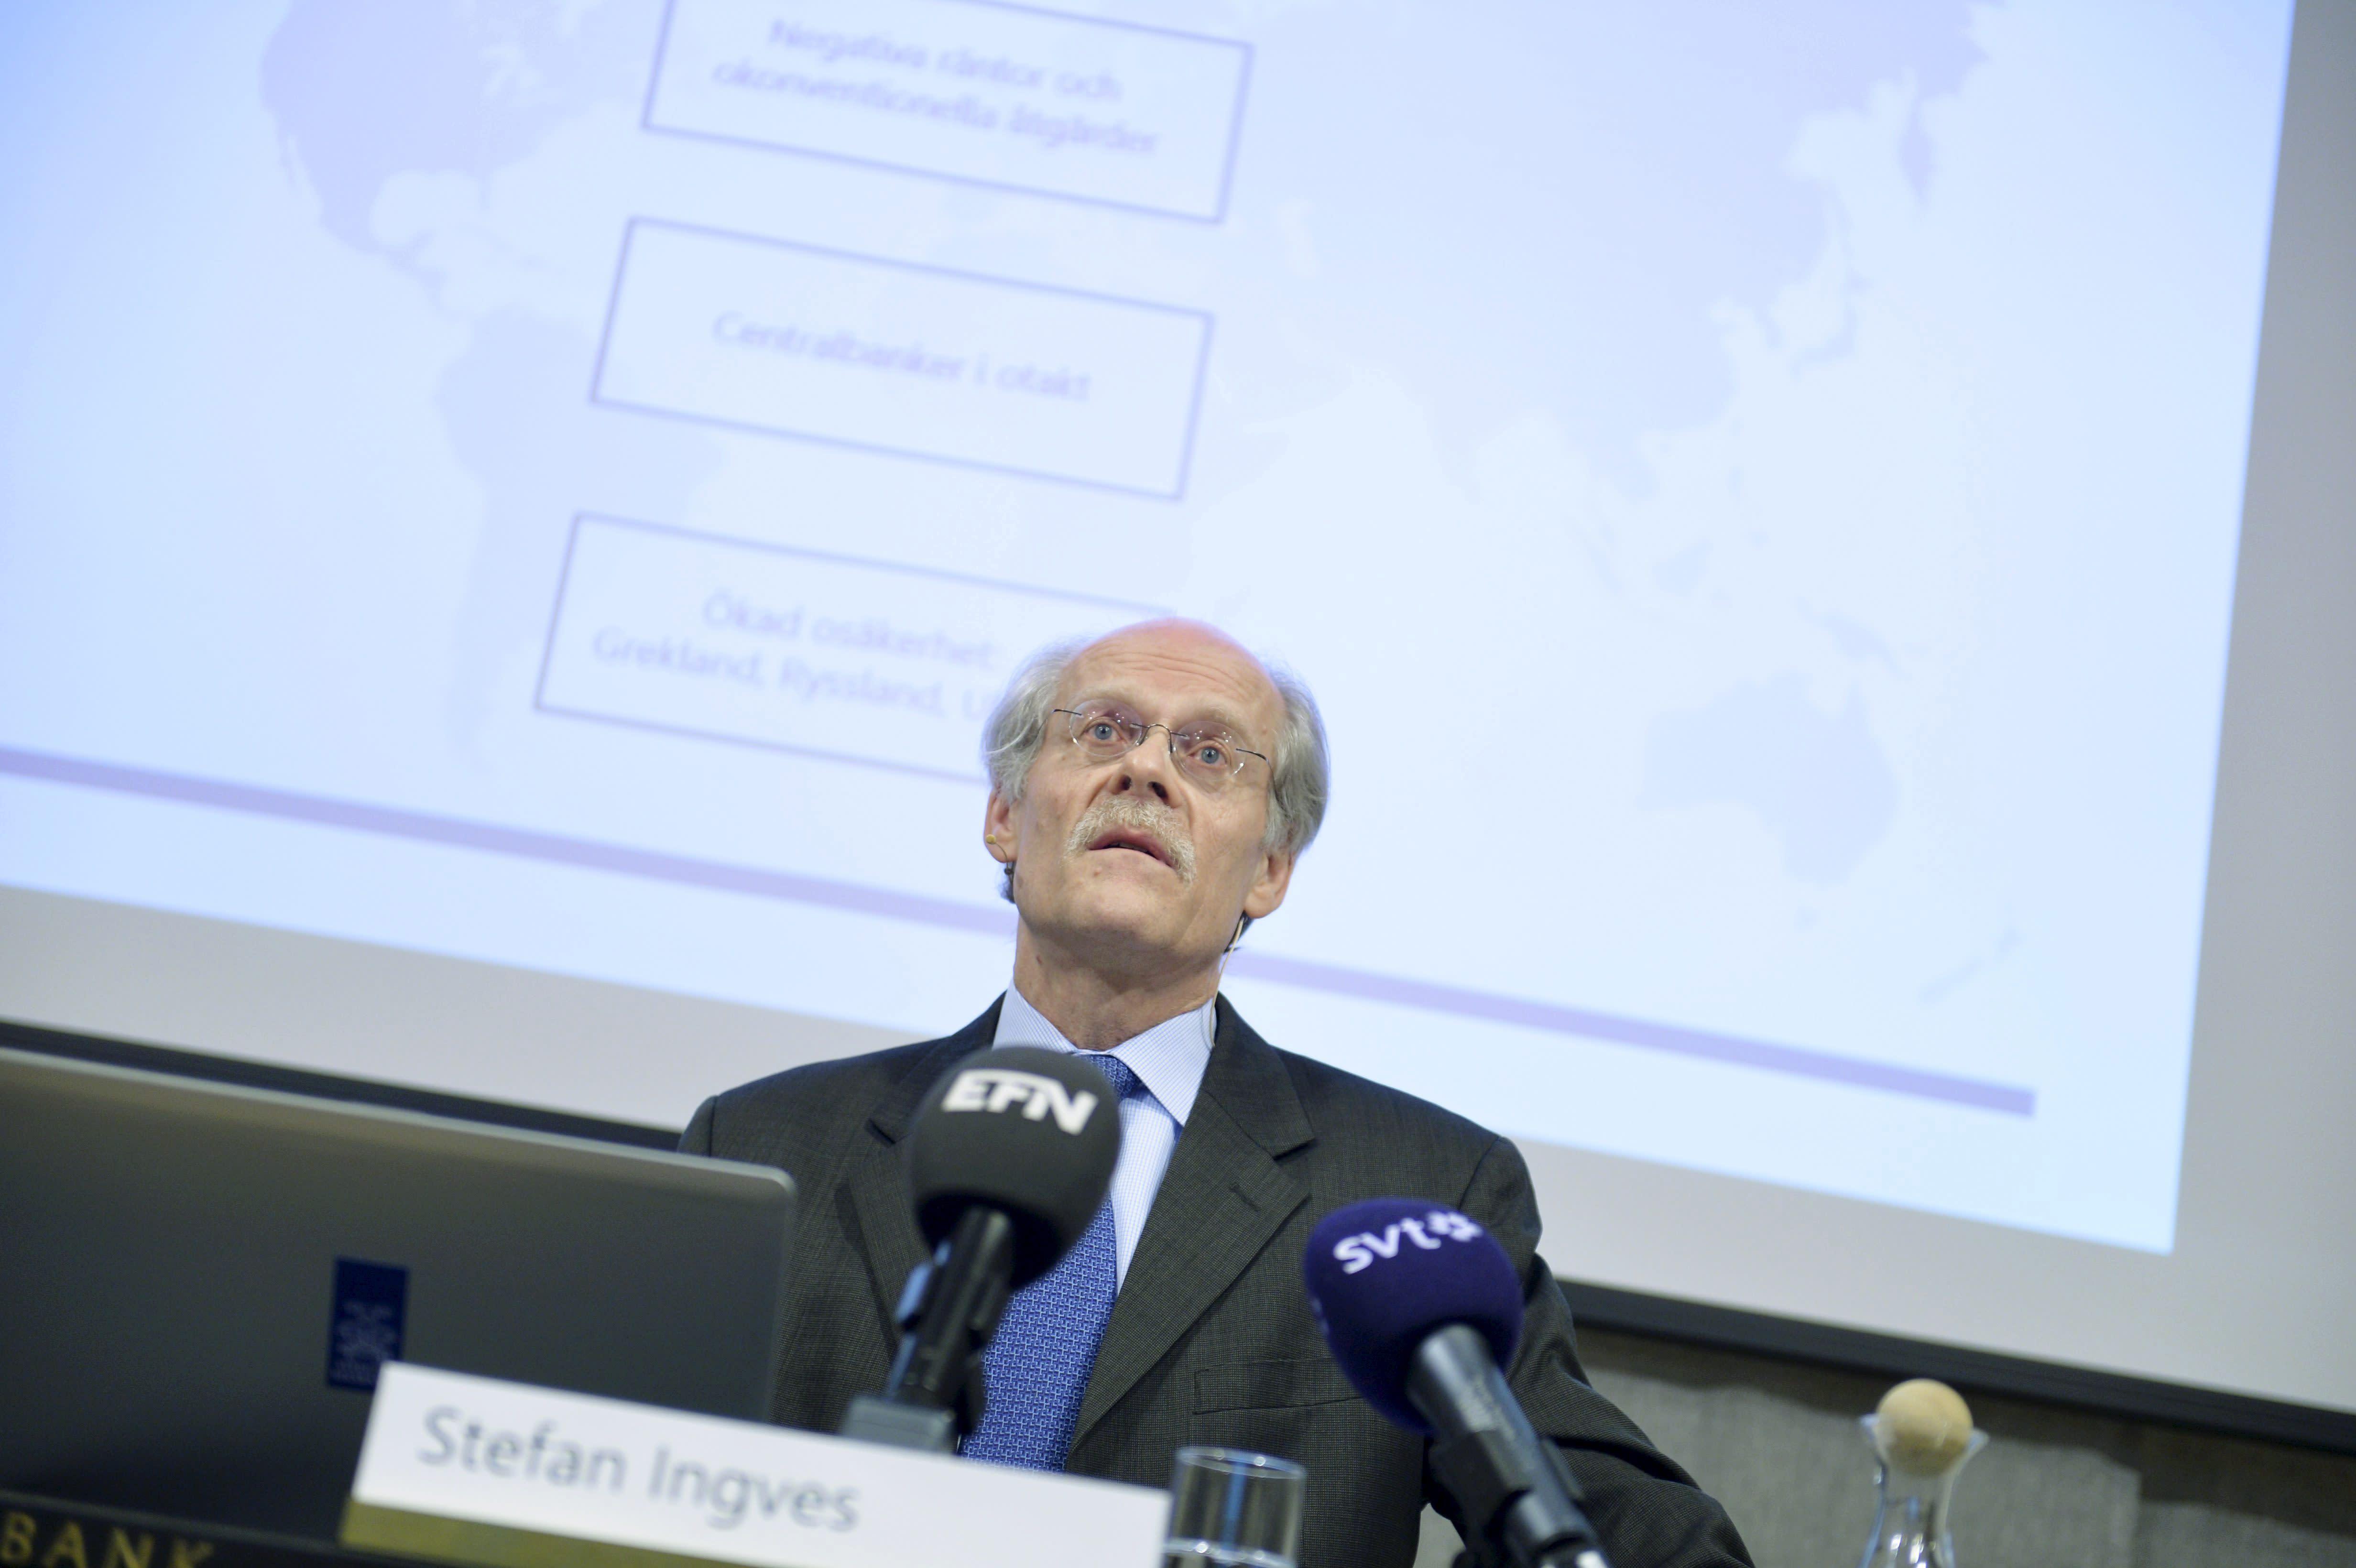 Stefan Ingves, governor of the Swedish central bank Riksbanken, holds a news conference at the bank's headquarters in Stockholm, on February 12, 2015 (AFP Photo/Vilhelm Stokstad)